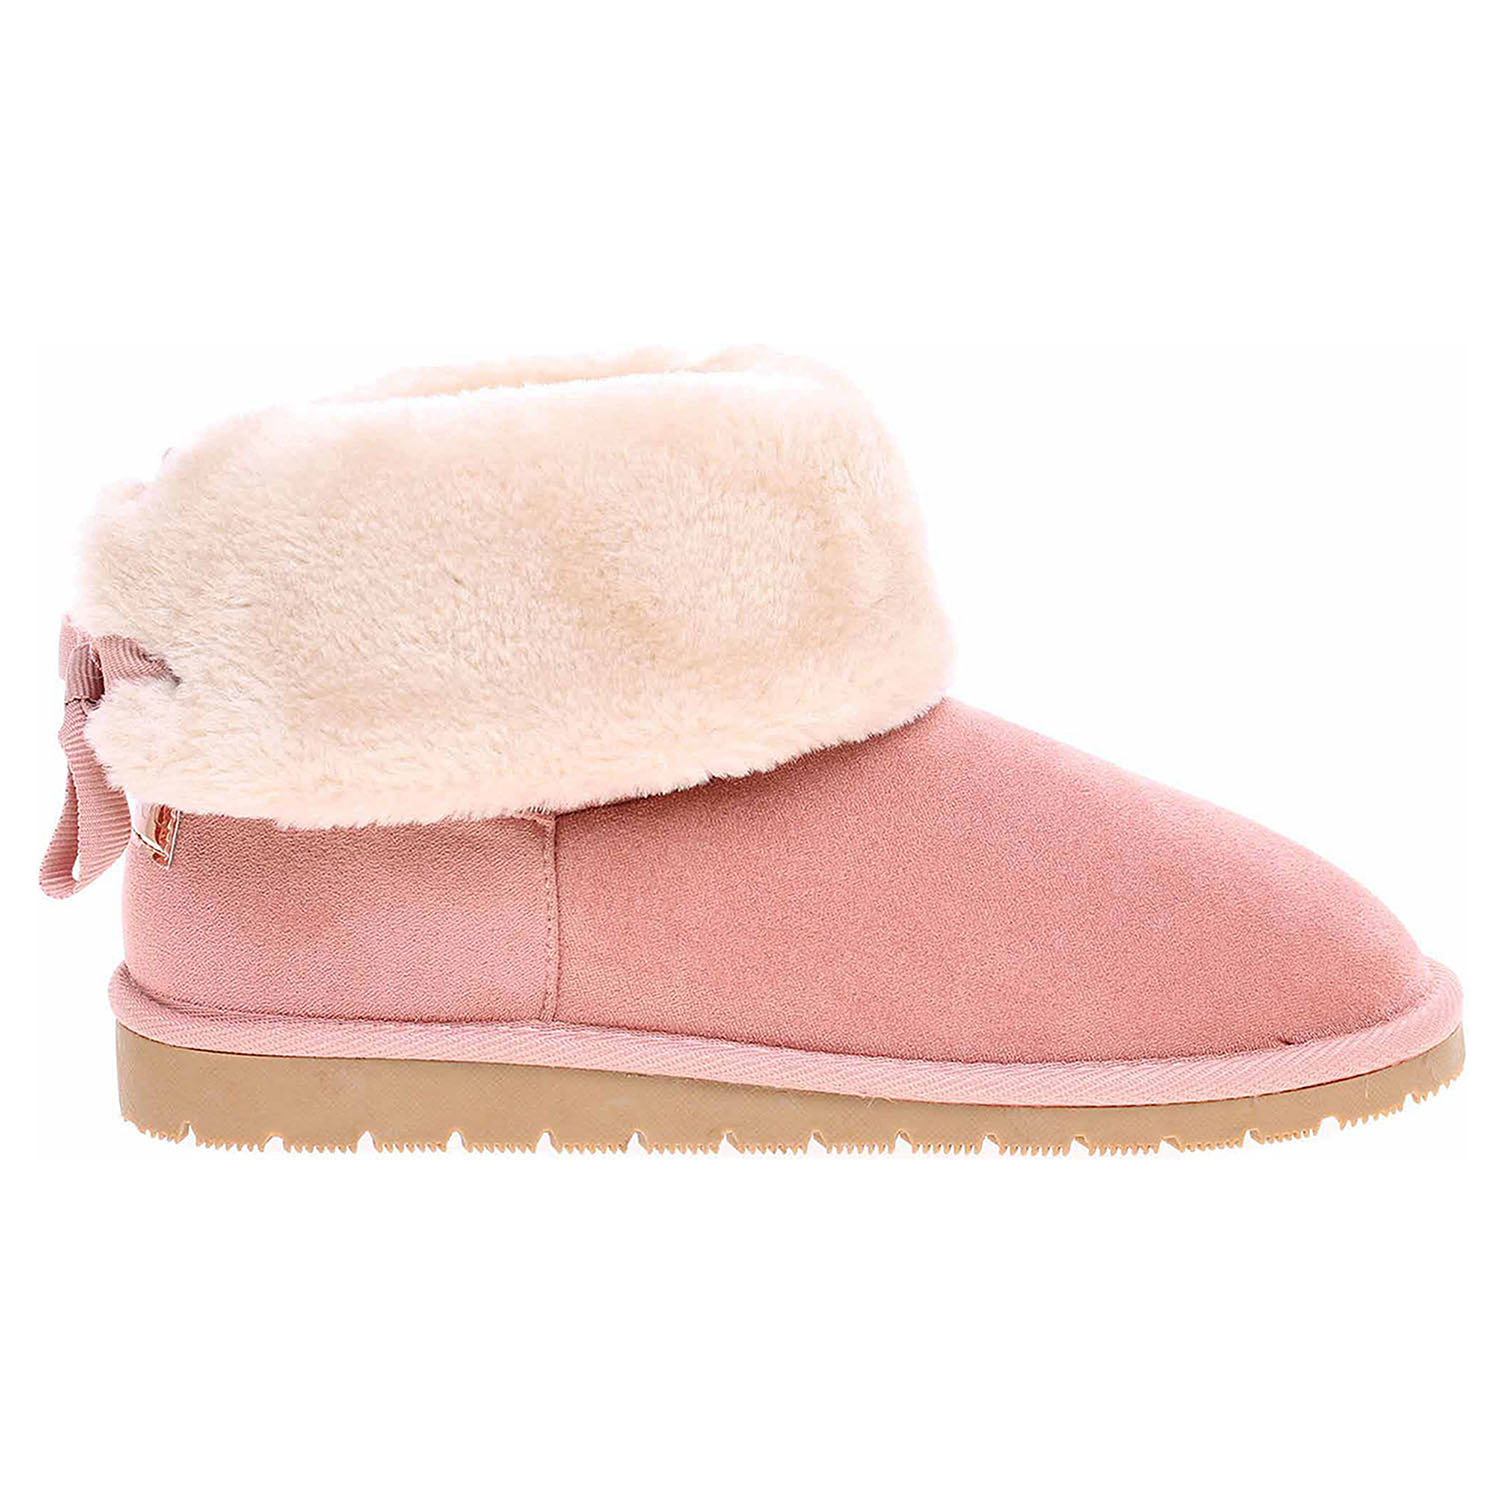 s.Oliver dámská obuv 5-26476-21 old rose 5-5-26476-21 512 39